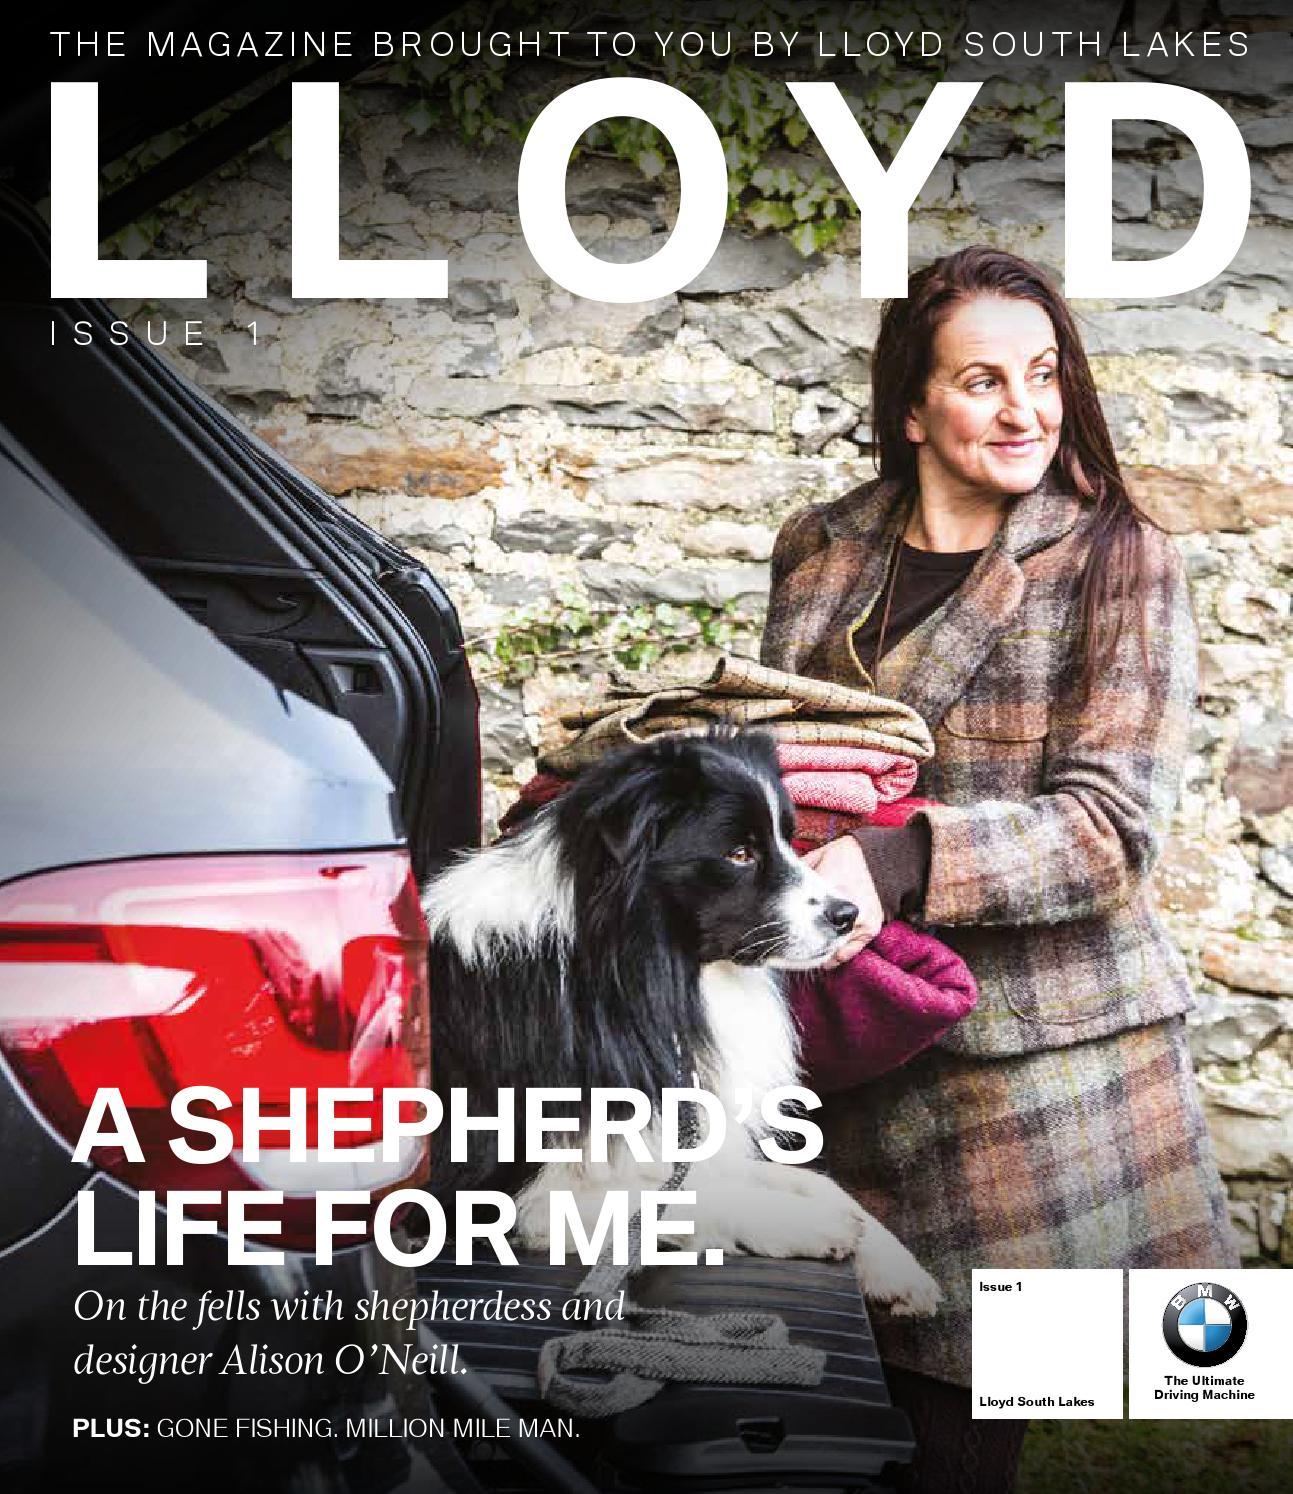 Lloyd South Lakes magazine - 2016 by Offstone Publishing - issuu e99b4ba9da0c